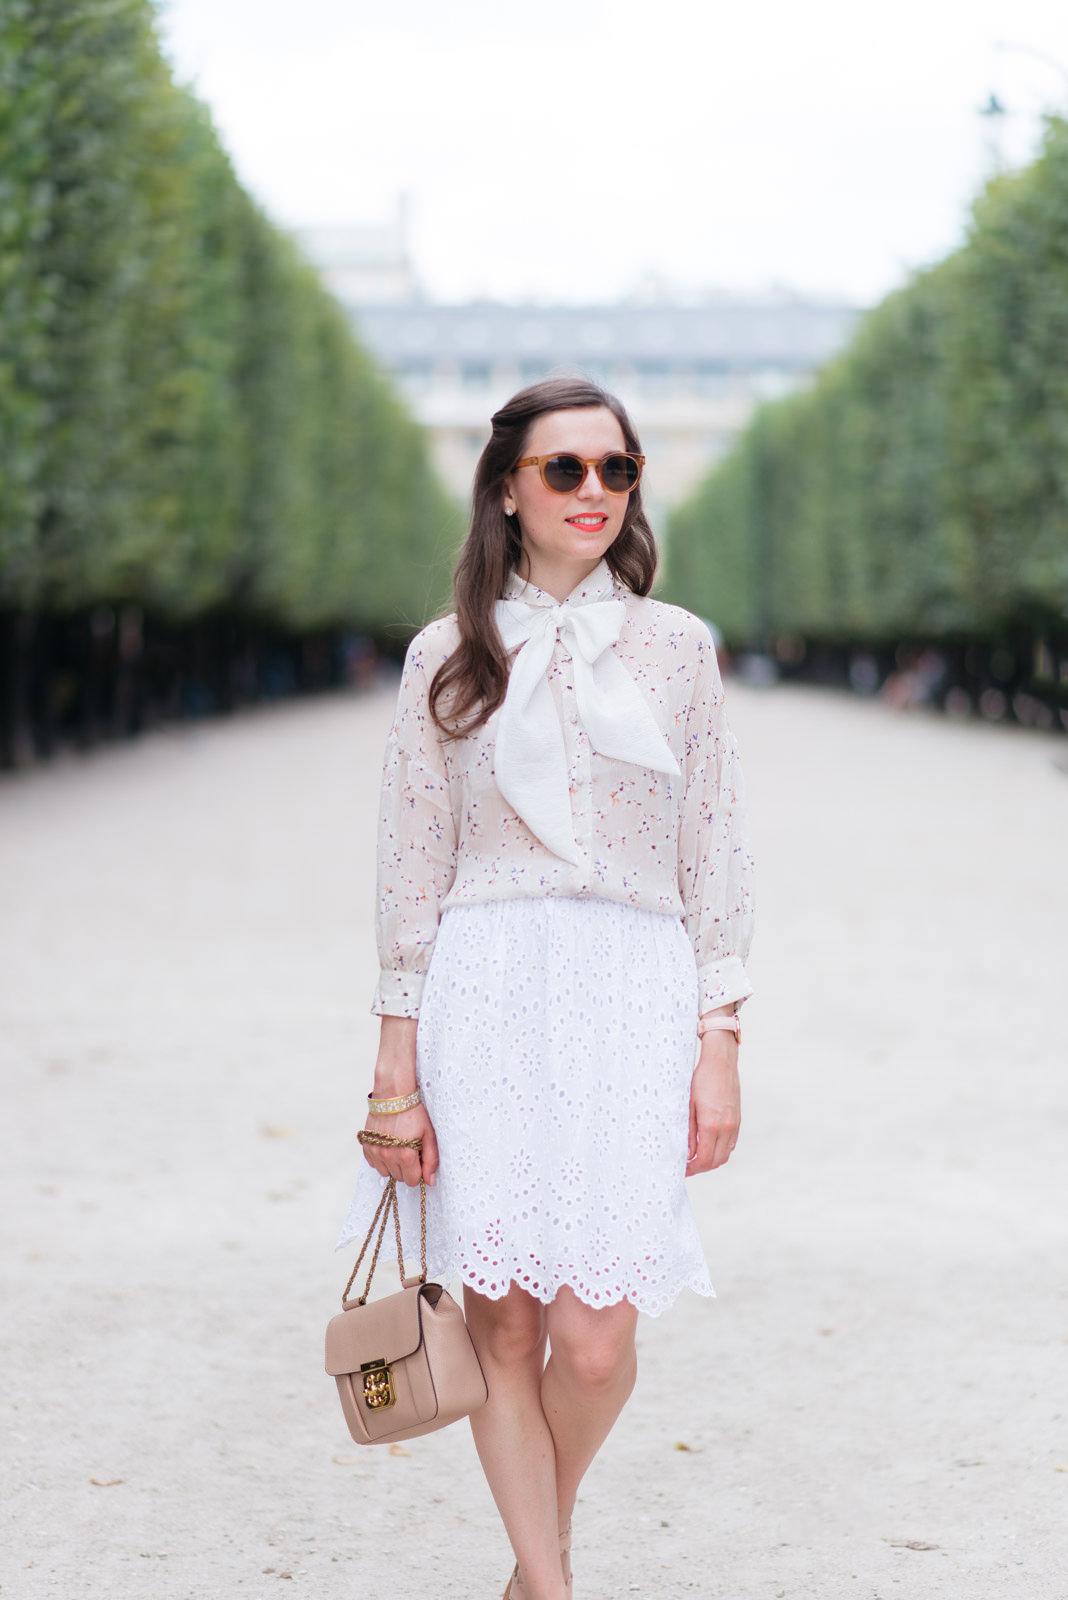 Blog-Mode-And-The-City-Looks-Blouse-Sister-Jane-Palais-Royal-7